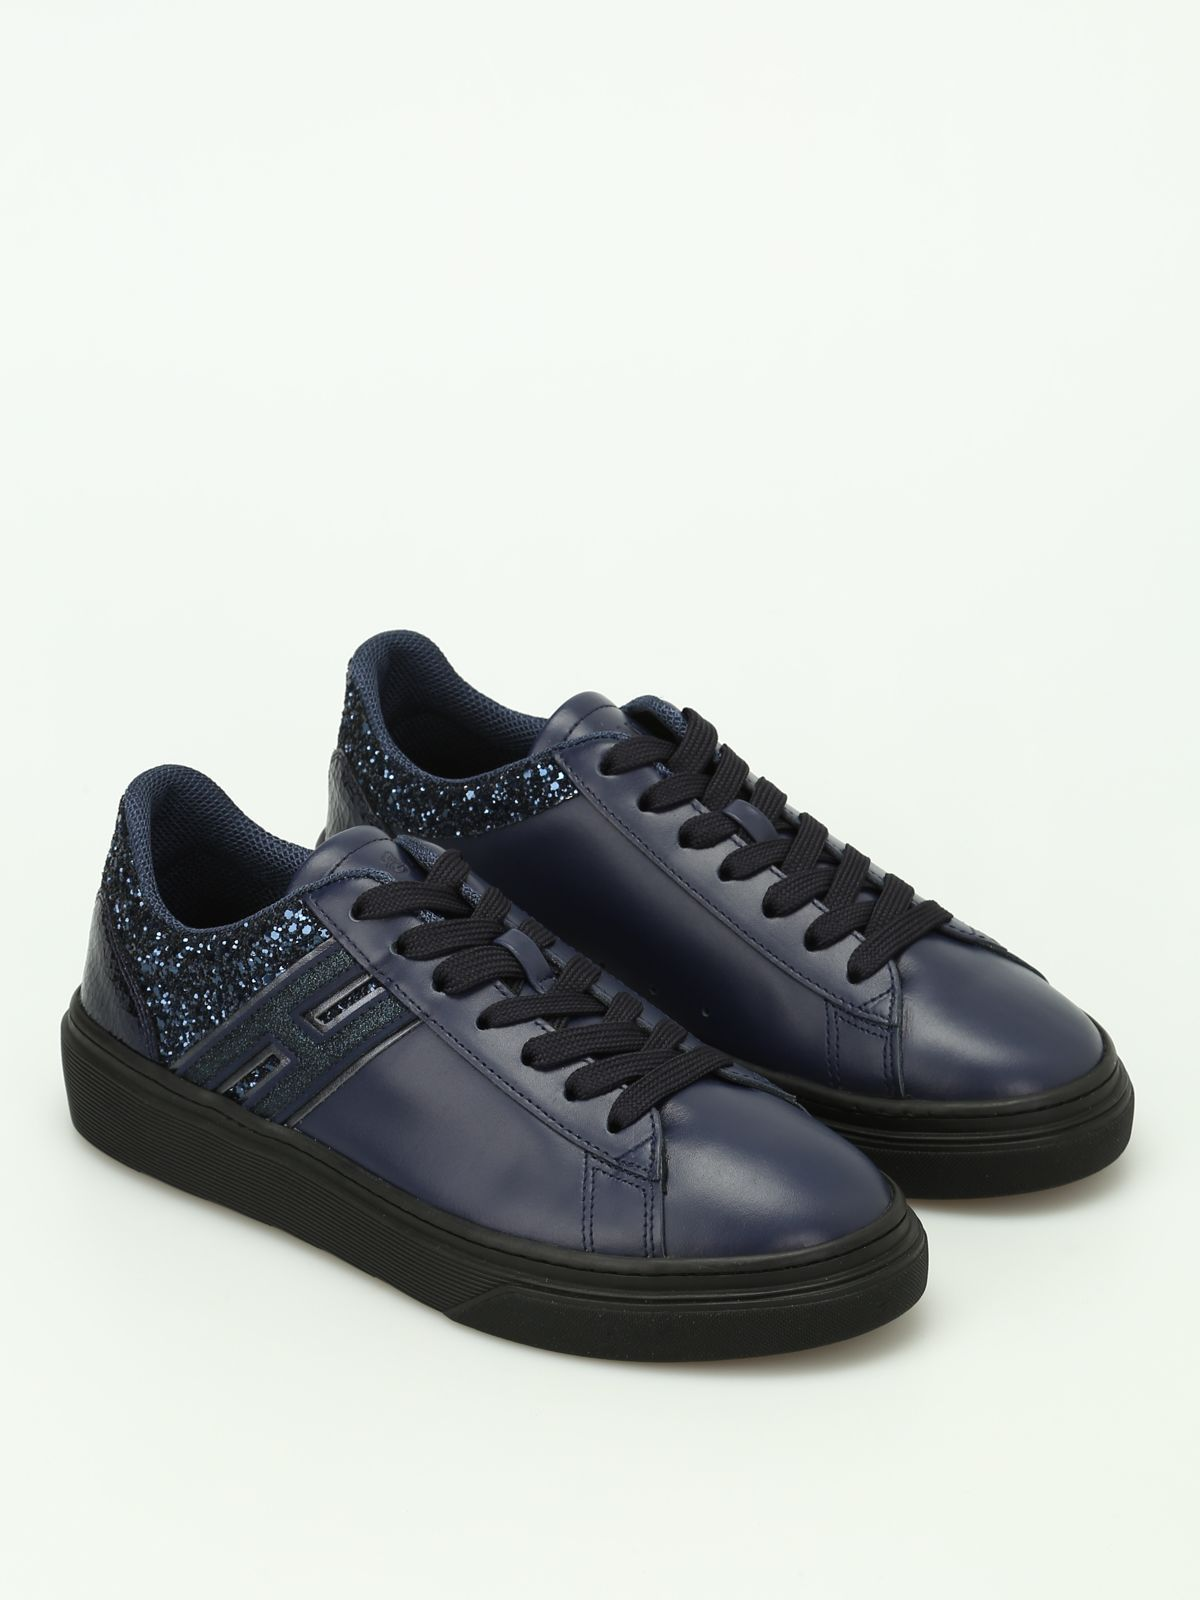 Sneakers H340 leather black Hogan IQ2qmXE7